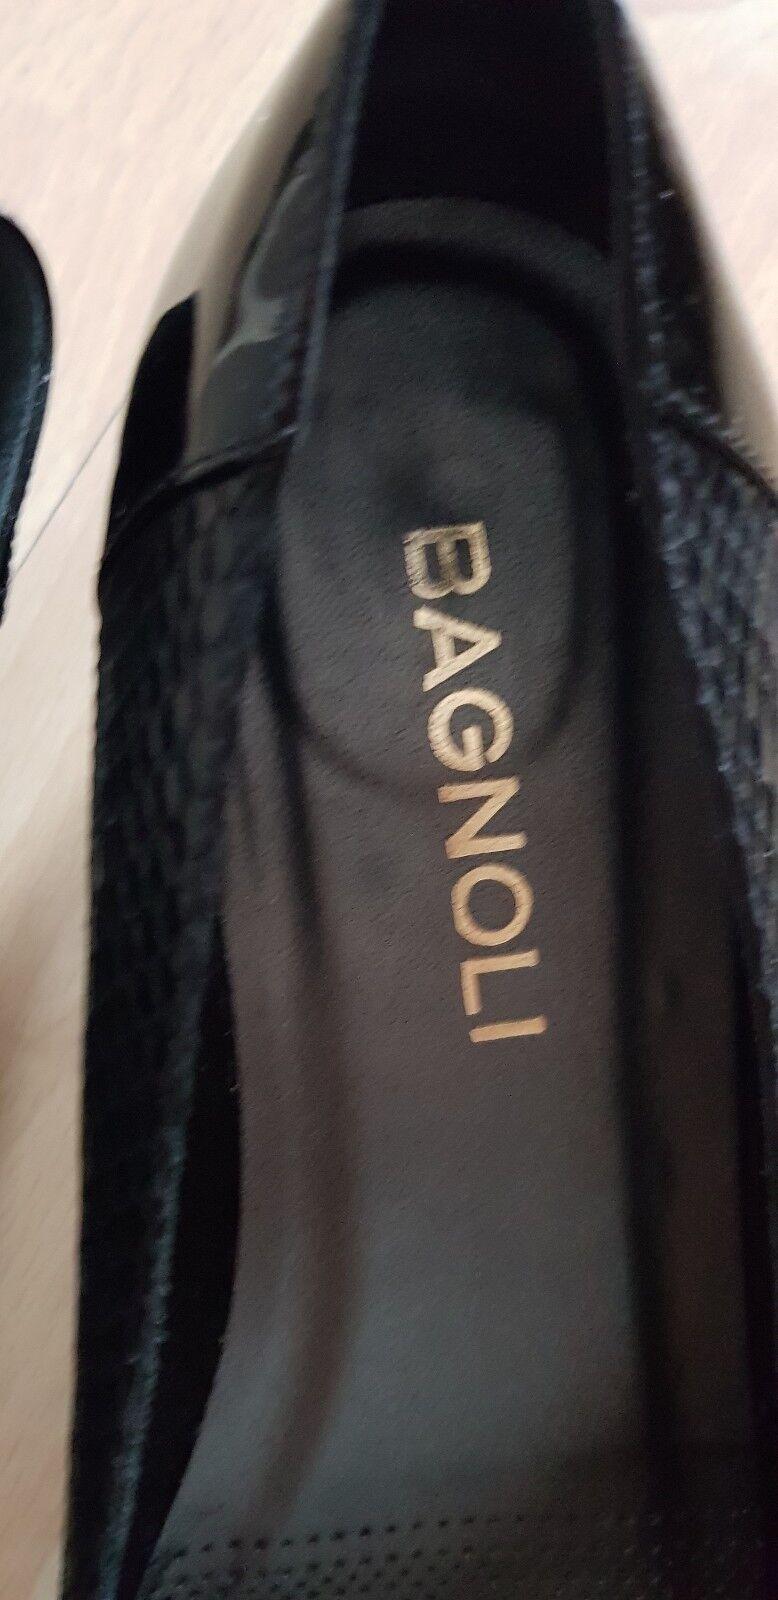 Damen Keilpumps Gr. 38 1/2 Bagnoli schwarz Echt Leder Marke Bagnoli 1/2 52b93e